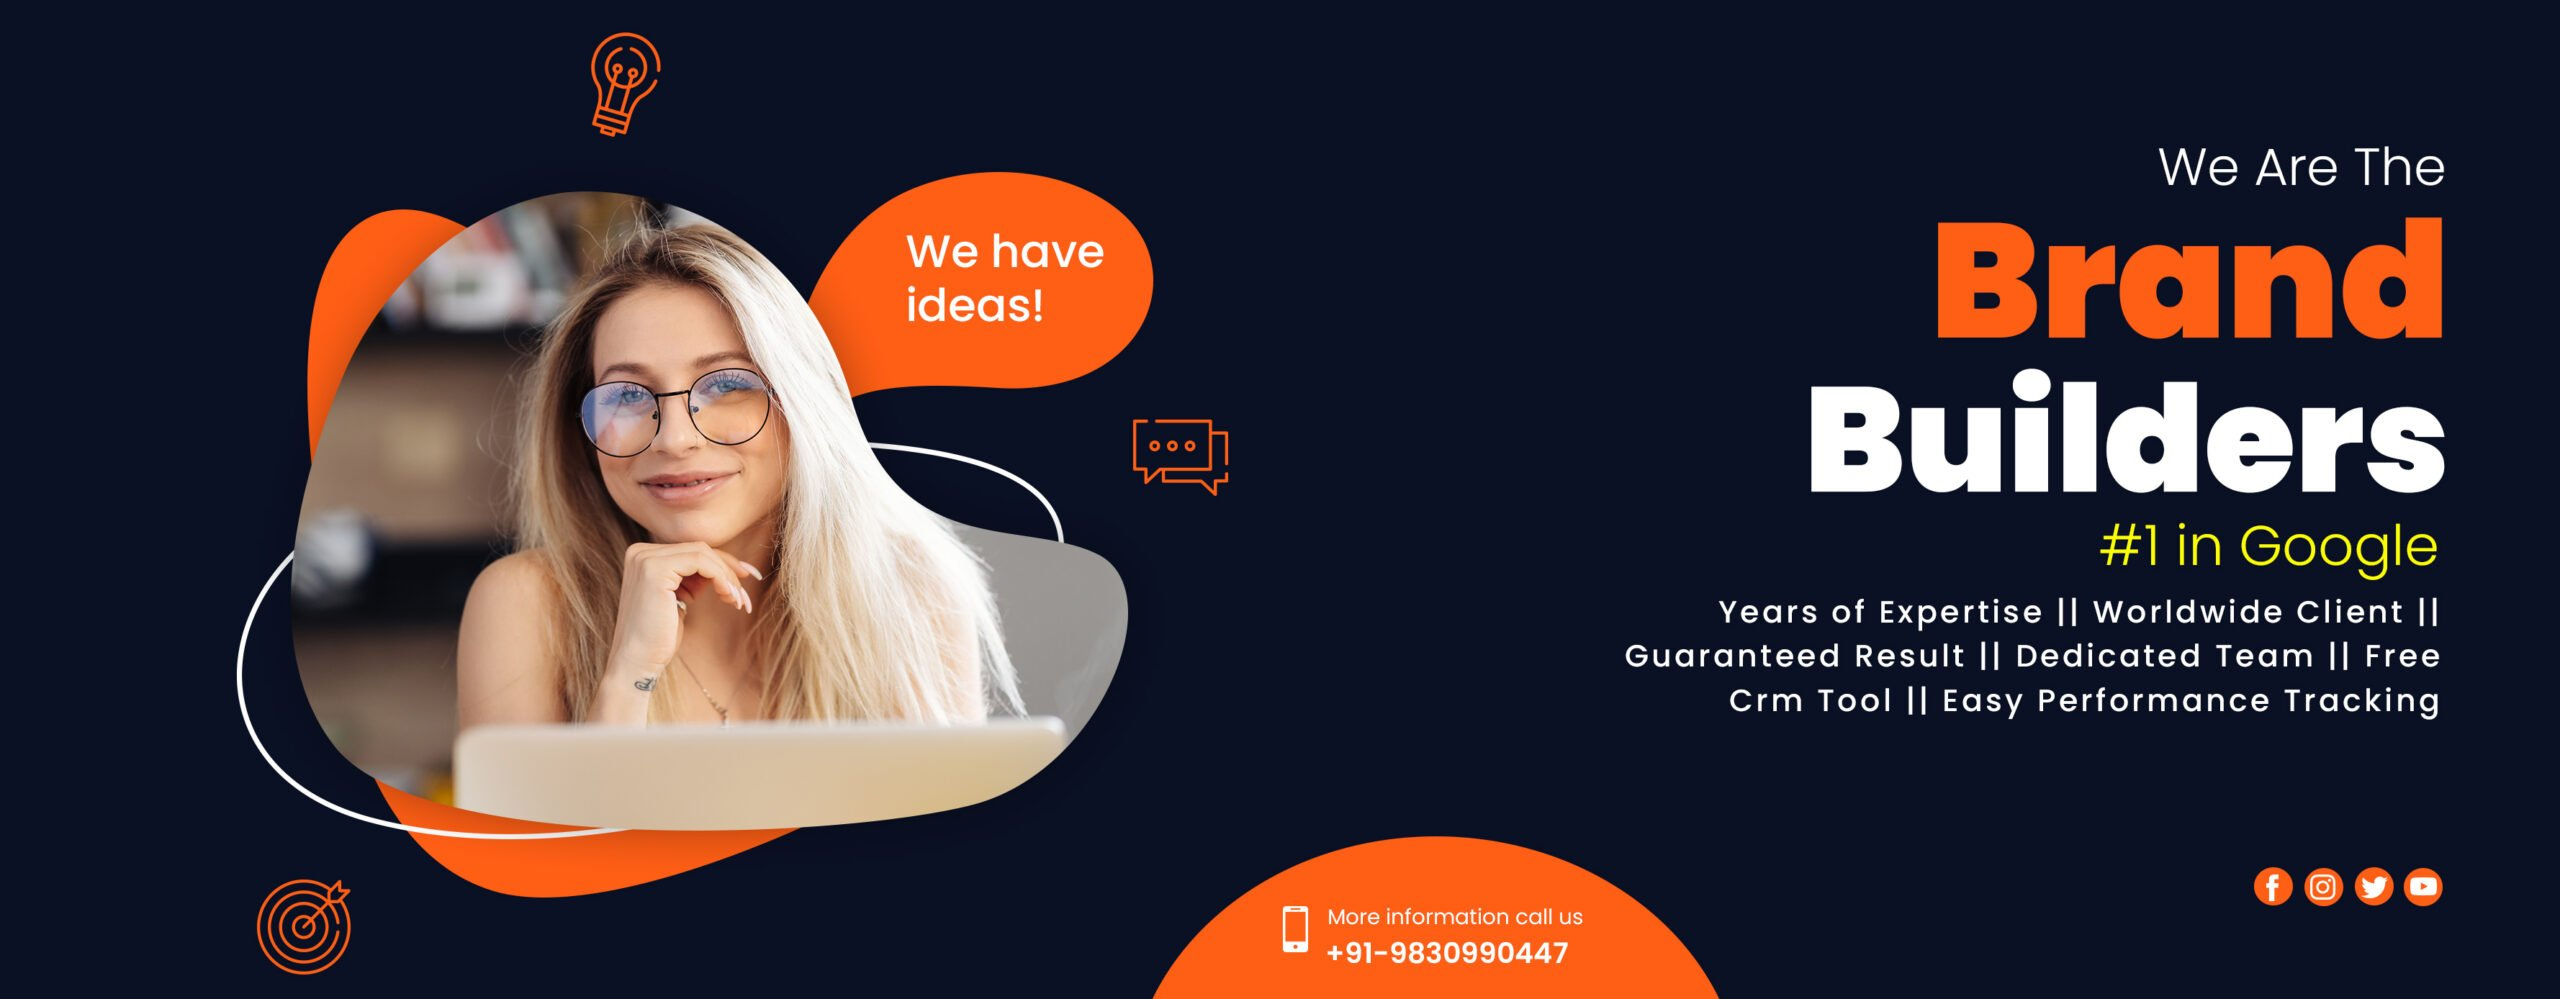 best-digital-marketing-company-home